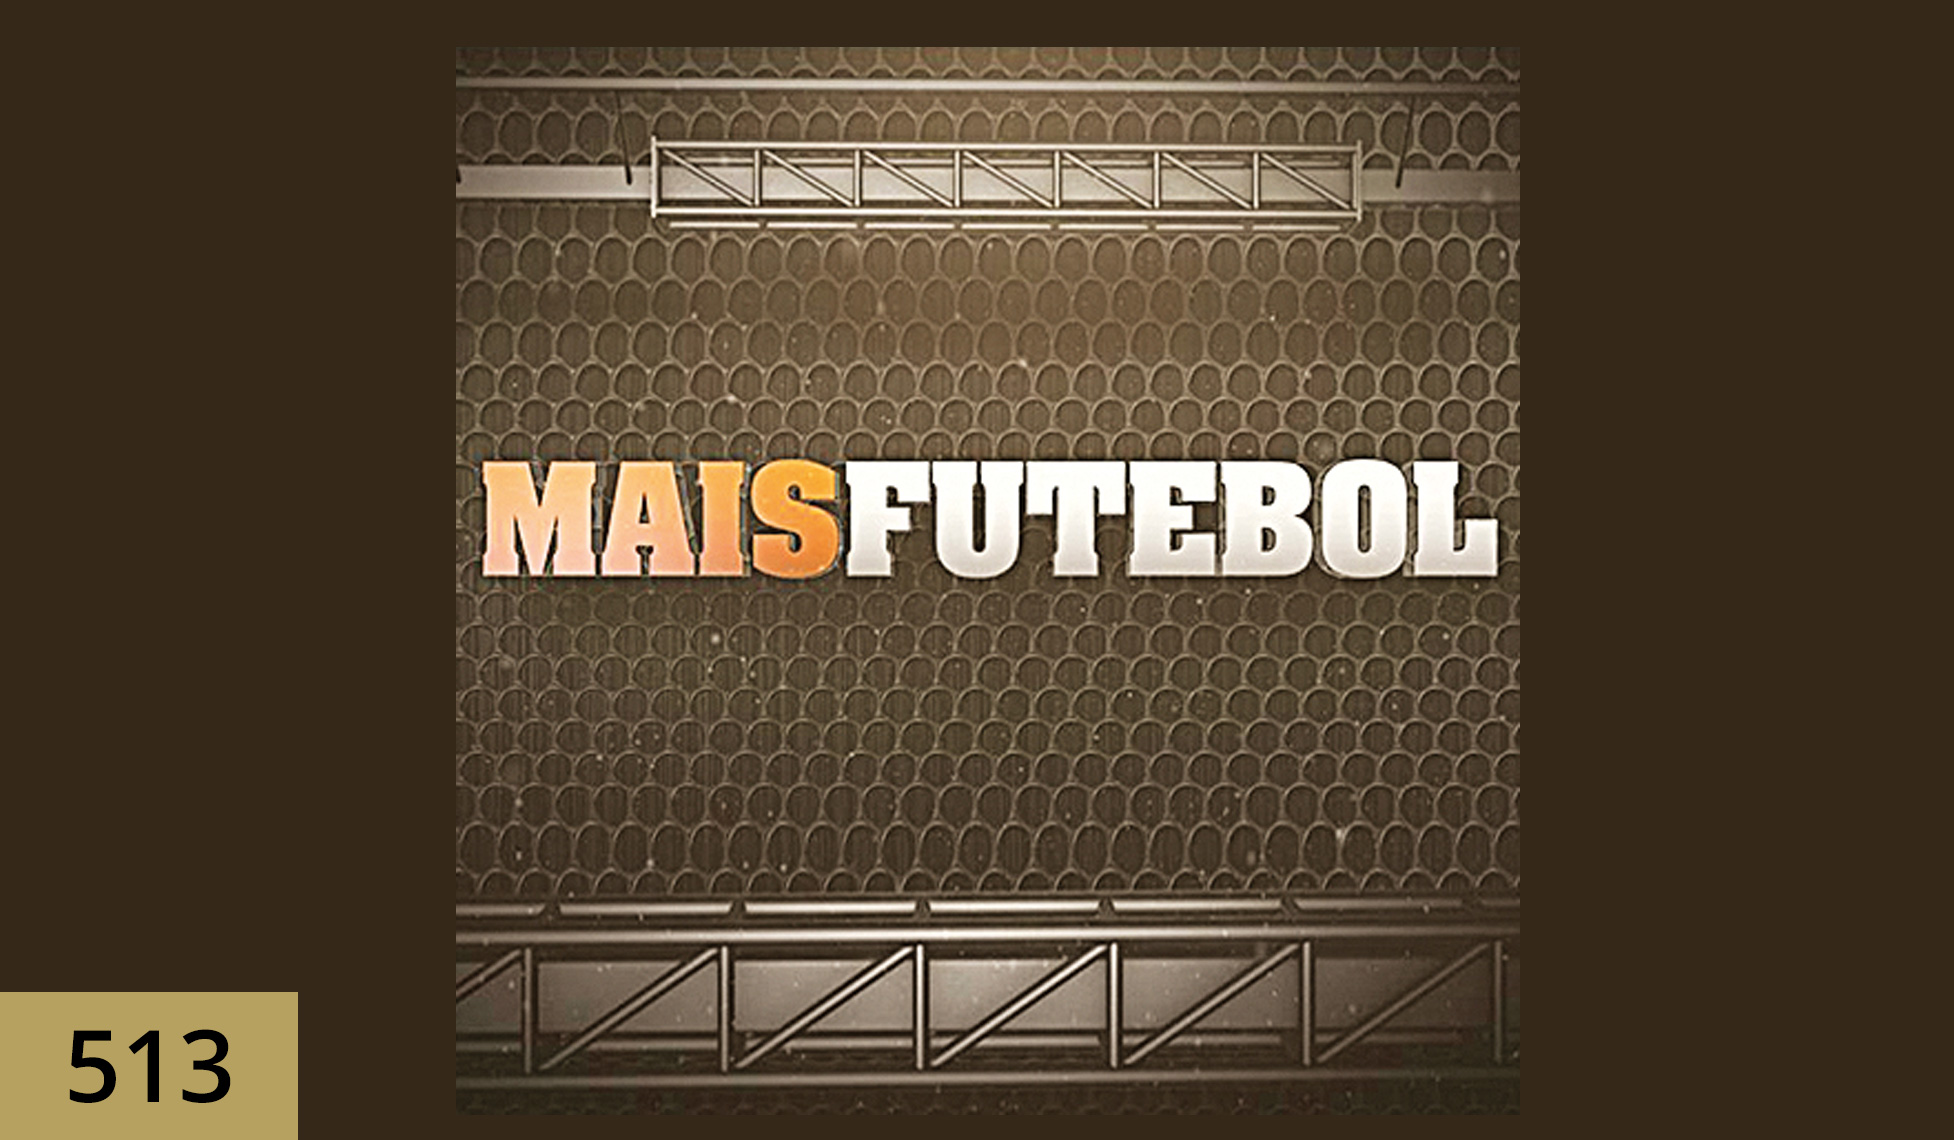 mais_futebol1597230013.jpg